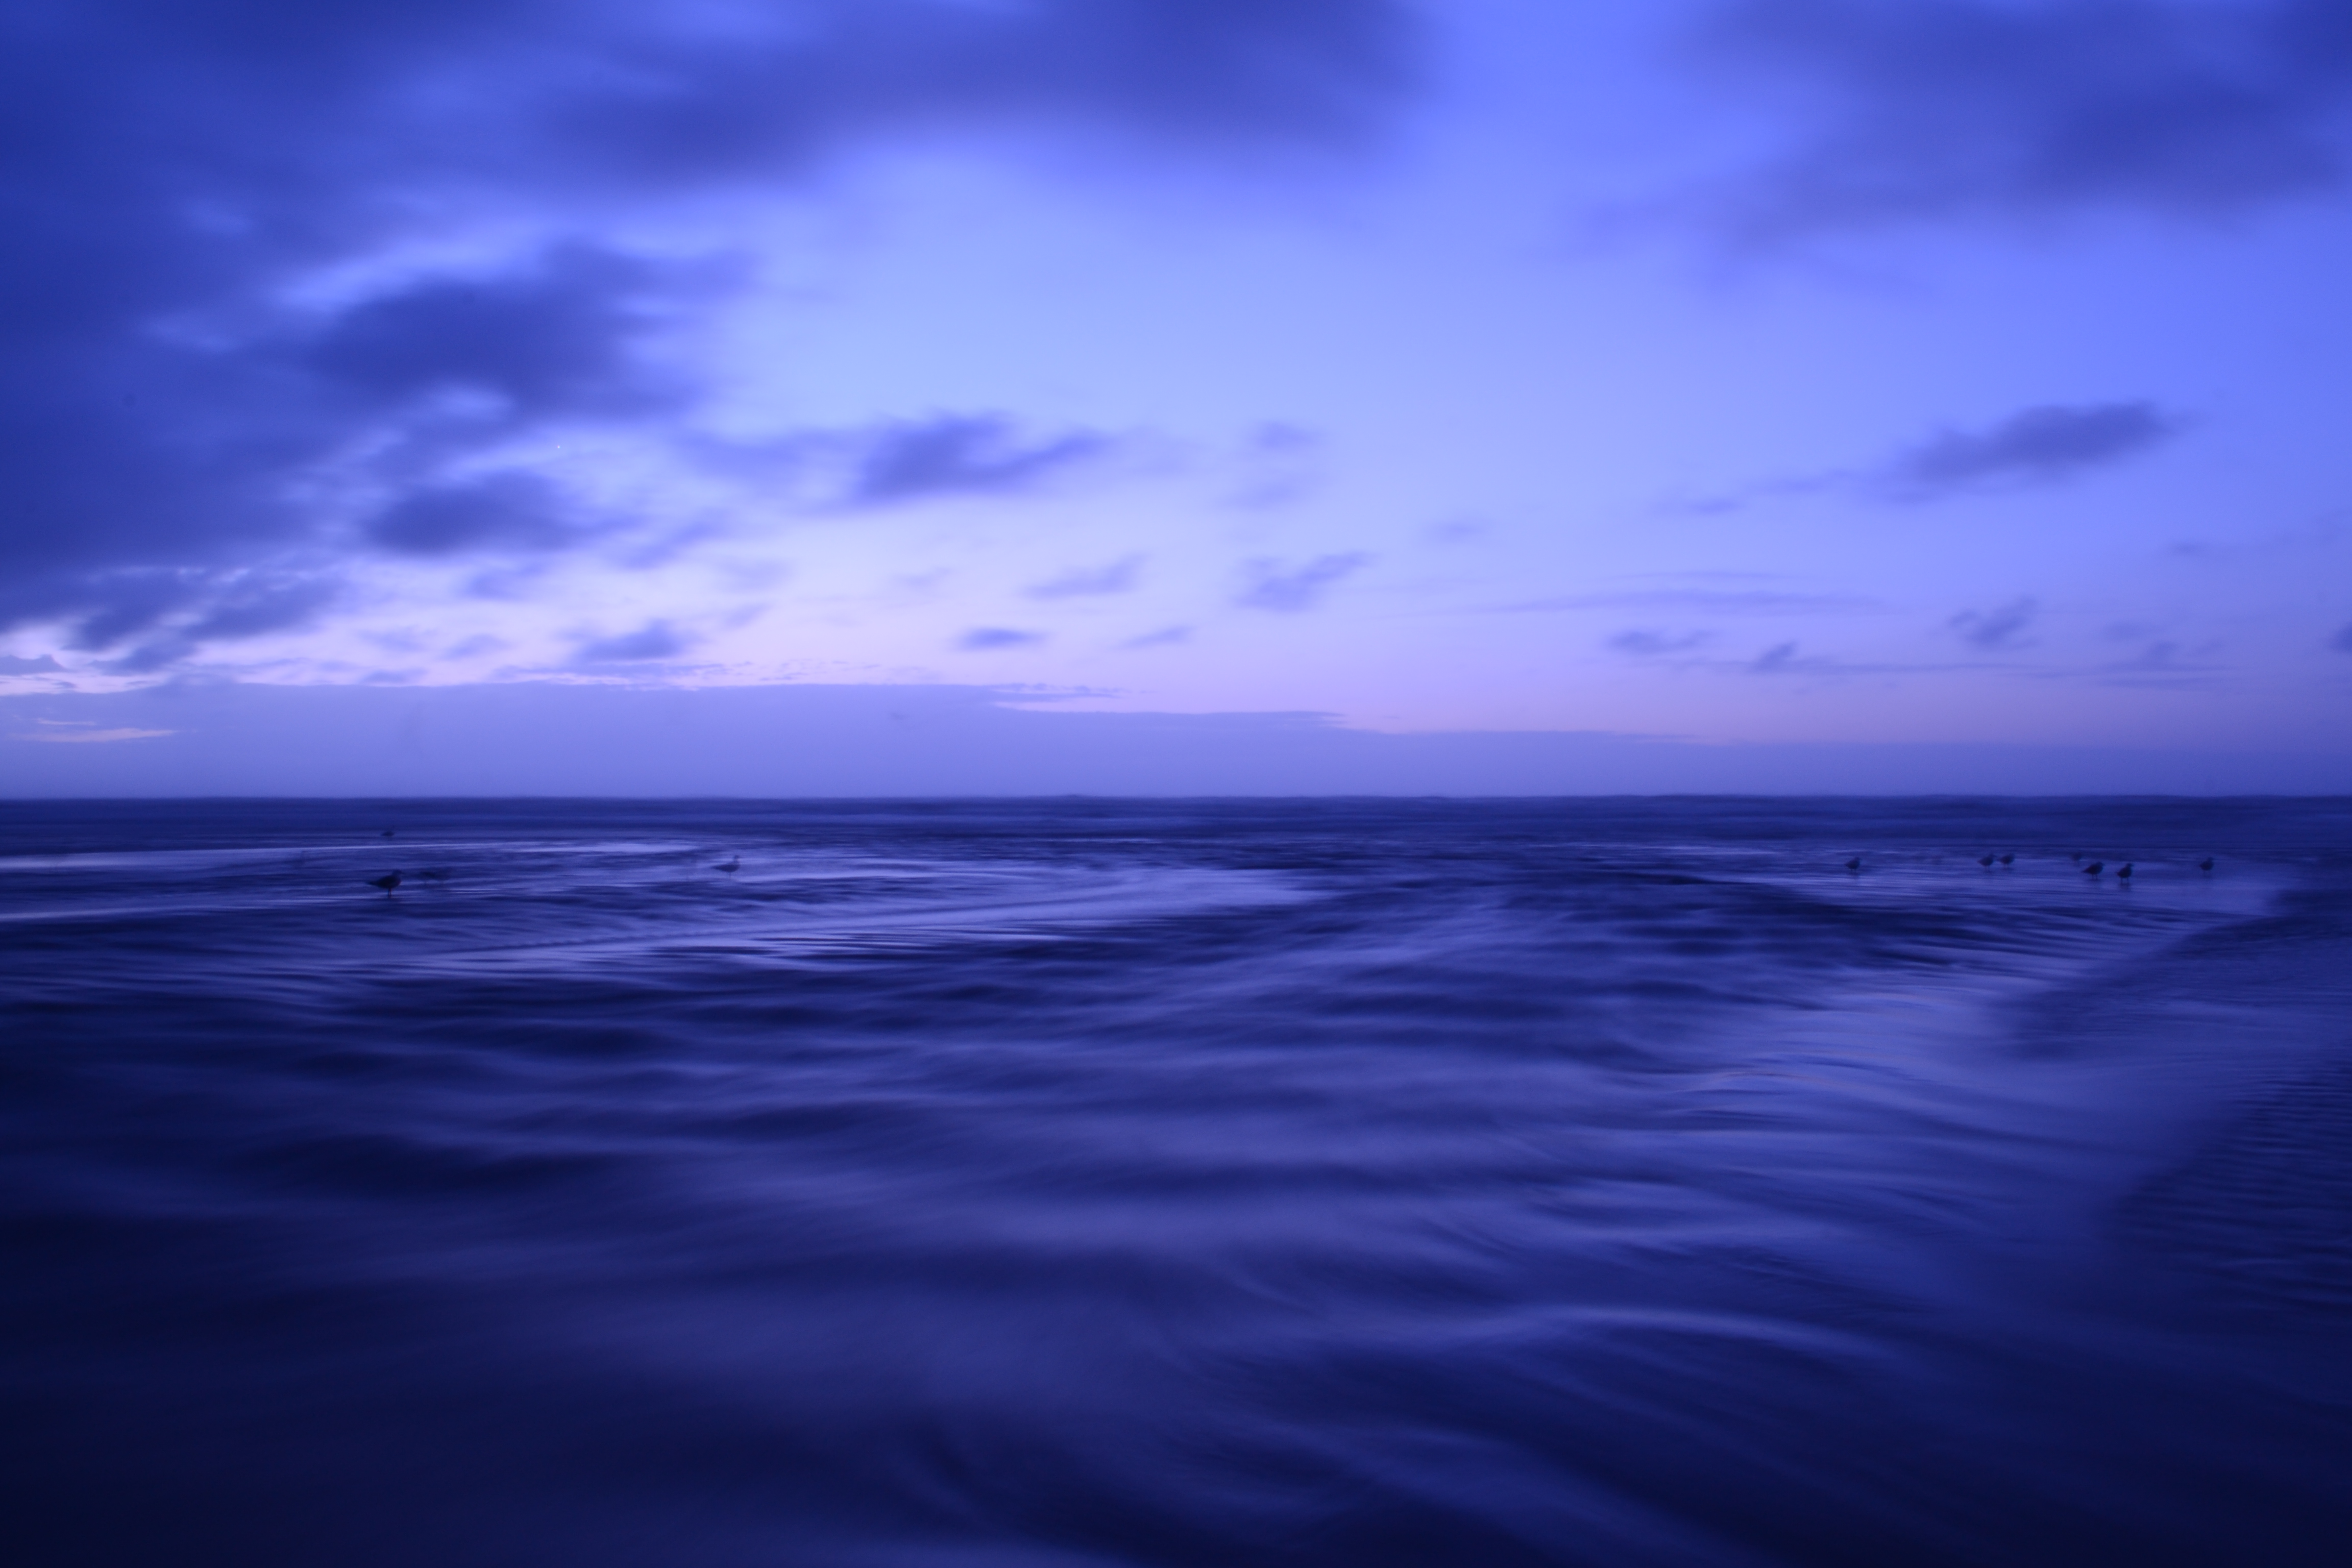 Fondos de pantalla Océano al anochecer morado